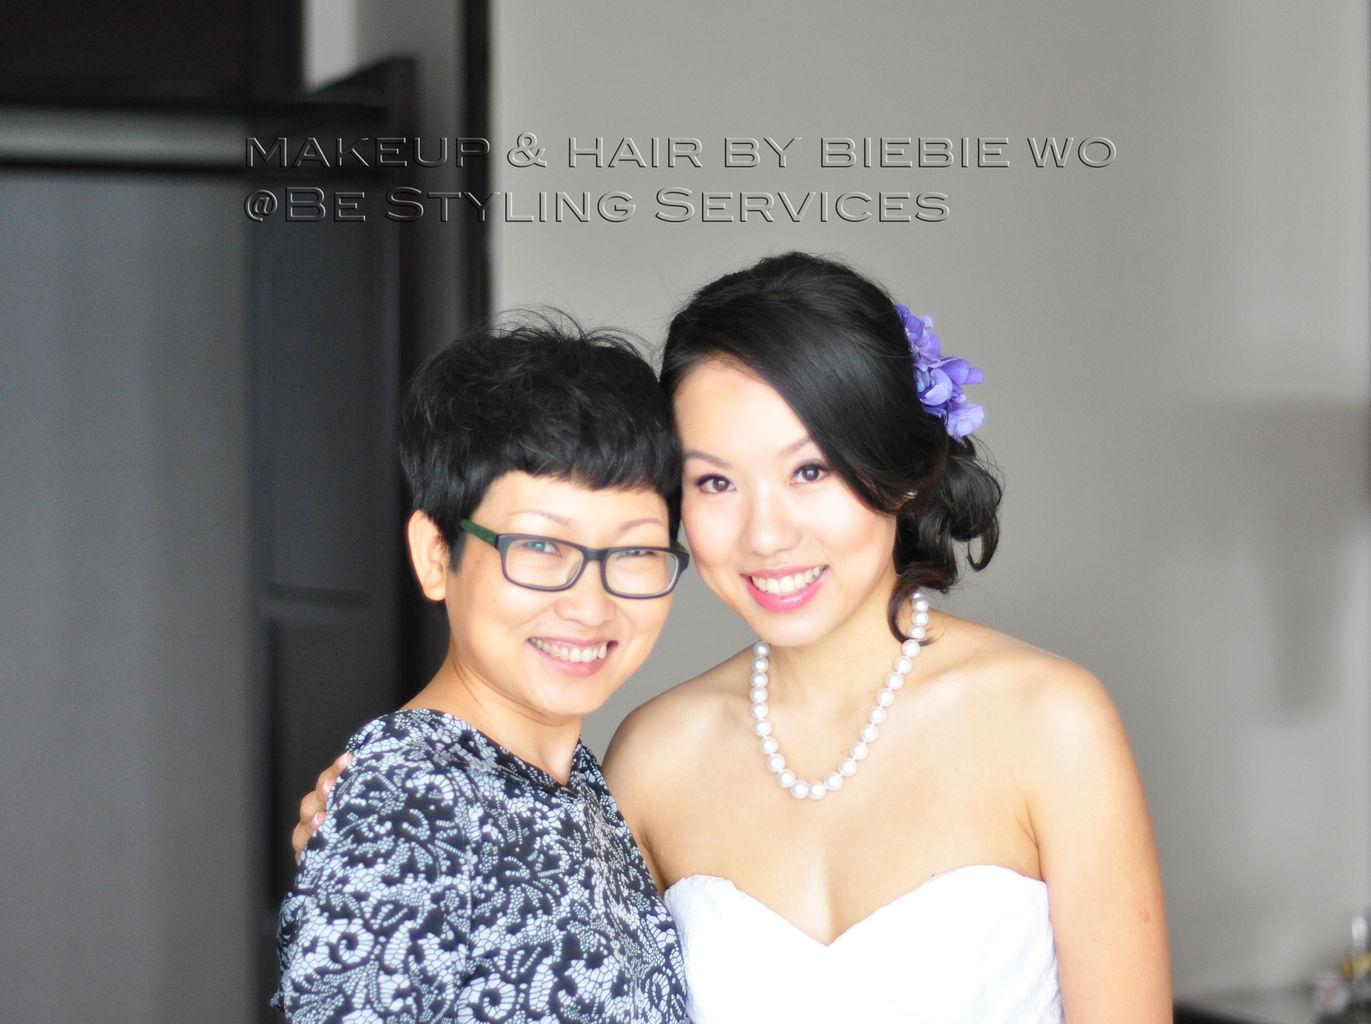 biebie wo professional makeup artist in hong kong